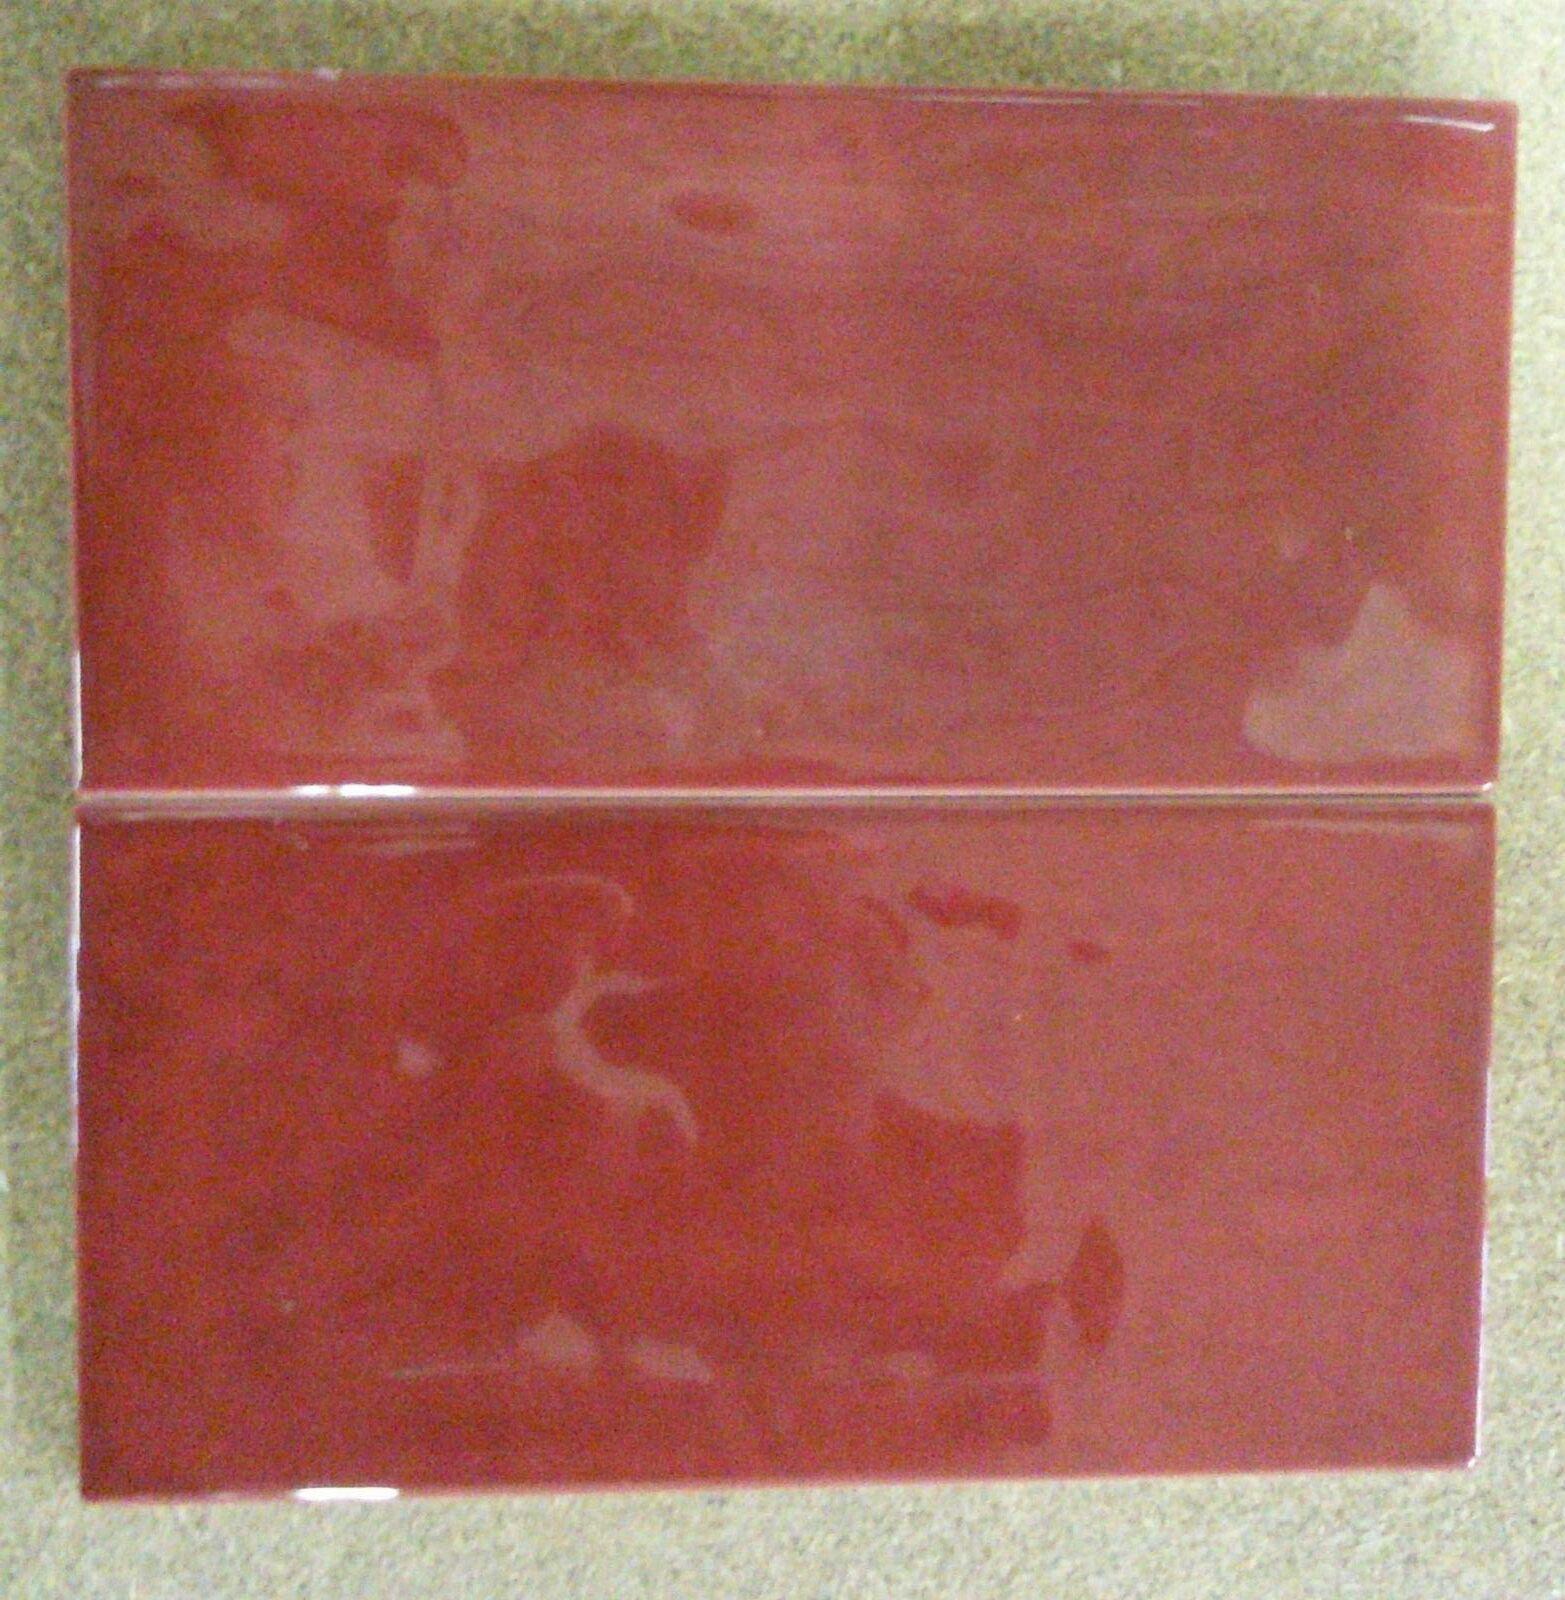 Tonalite 10x20 serie joyful colore cherry opus - Tonalite piastrelle prezzi ...